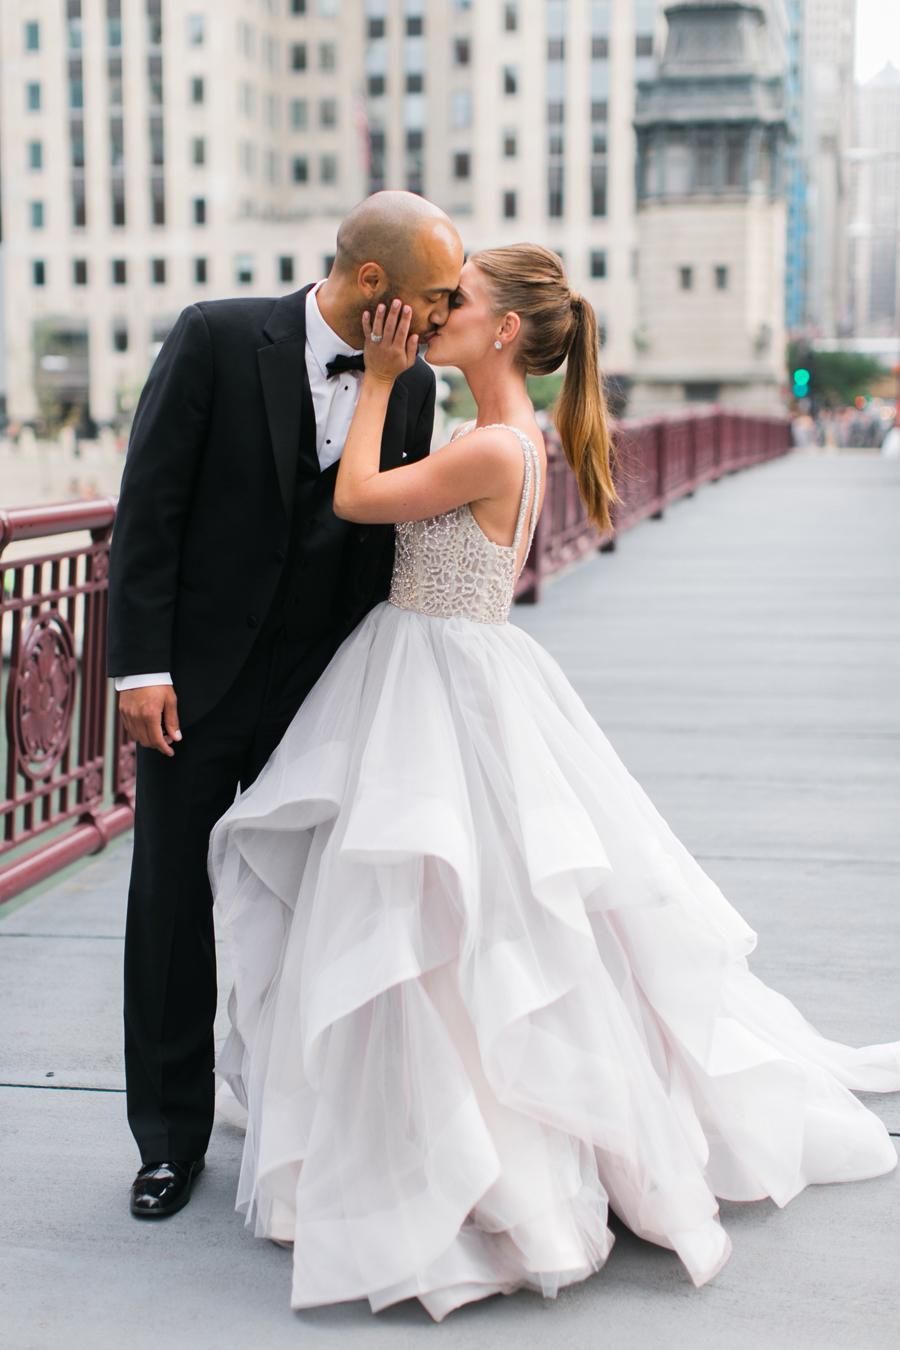 artistrie-co-best-wedding-photos-2015-020